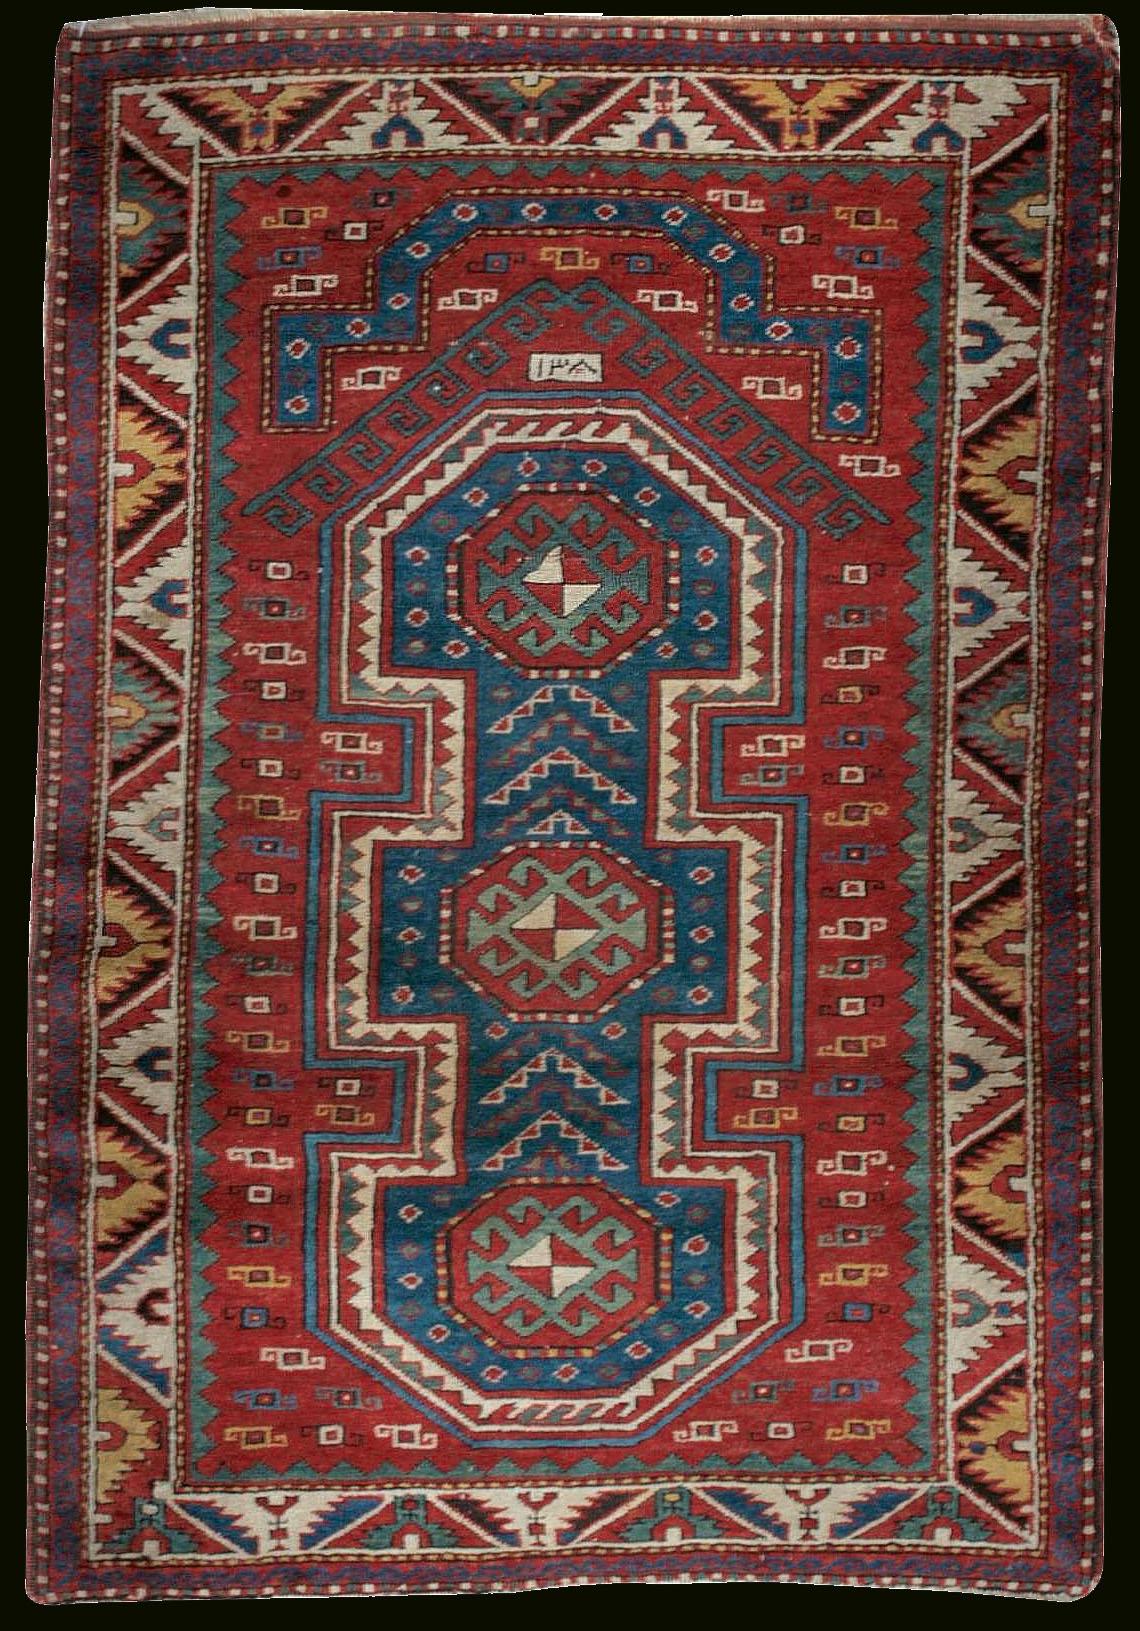 Ah 1308 1890 Ad Dated Antique Quot Shield Quot Kazak Namazlig Rug